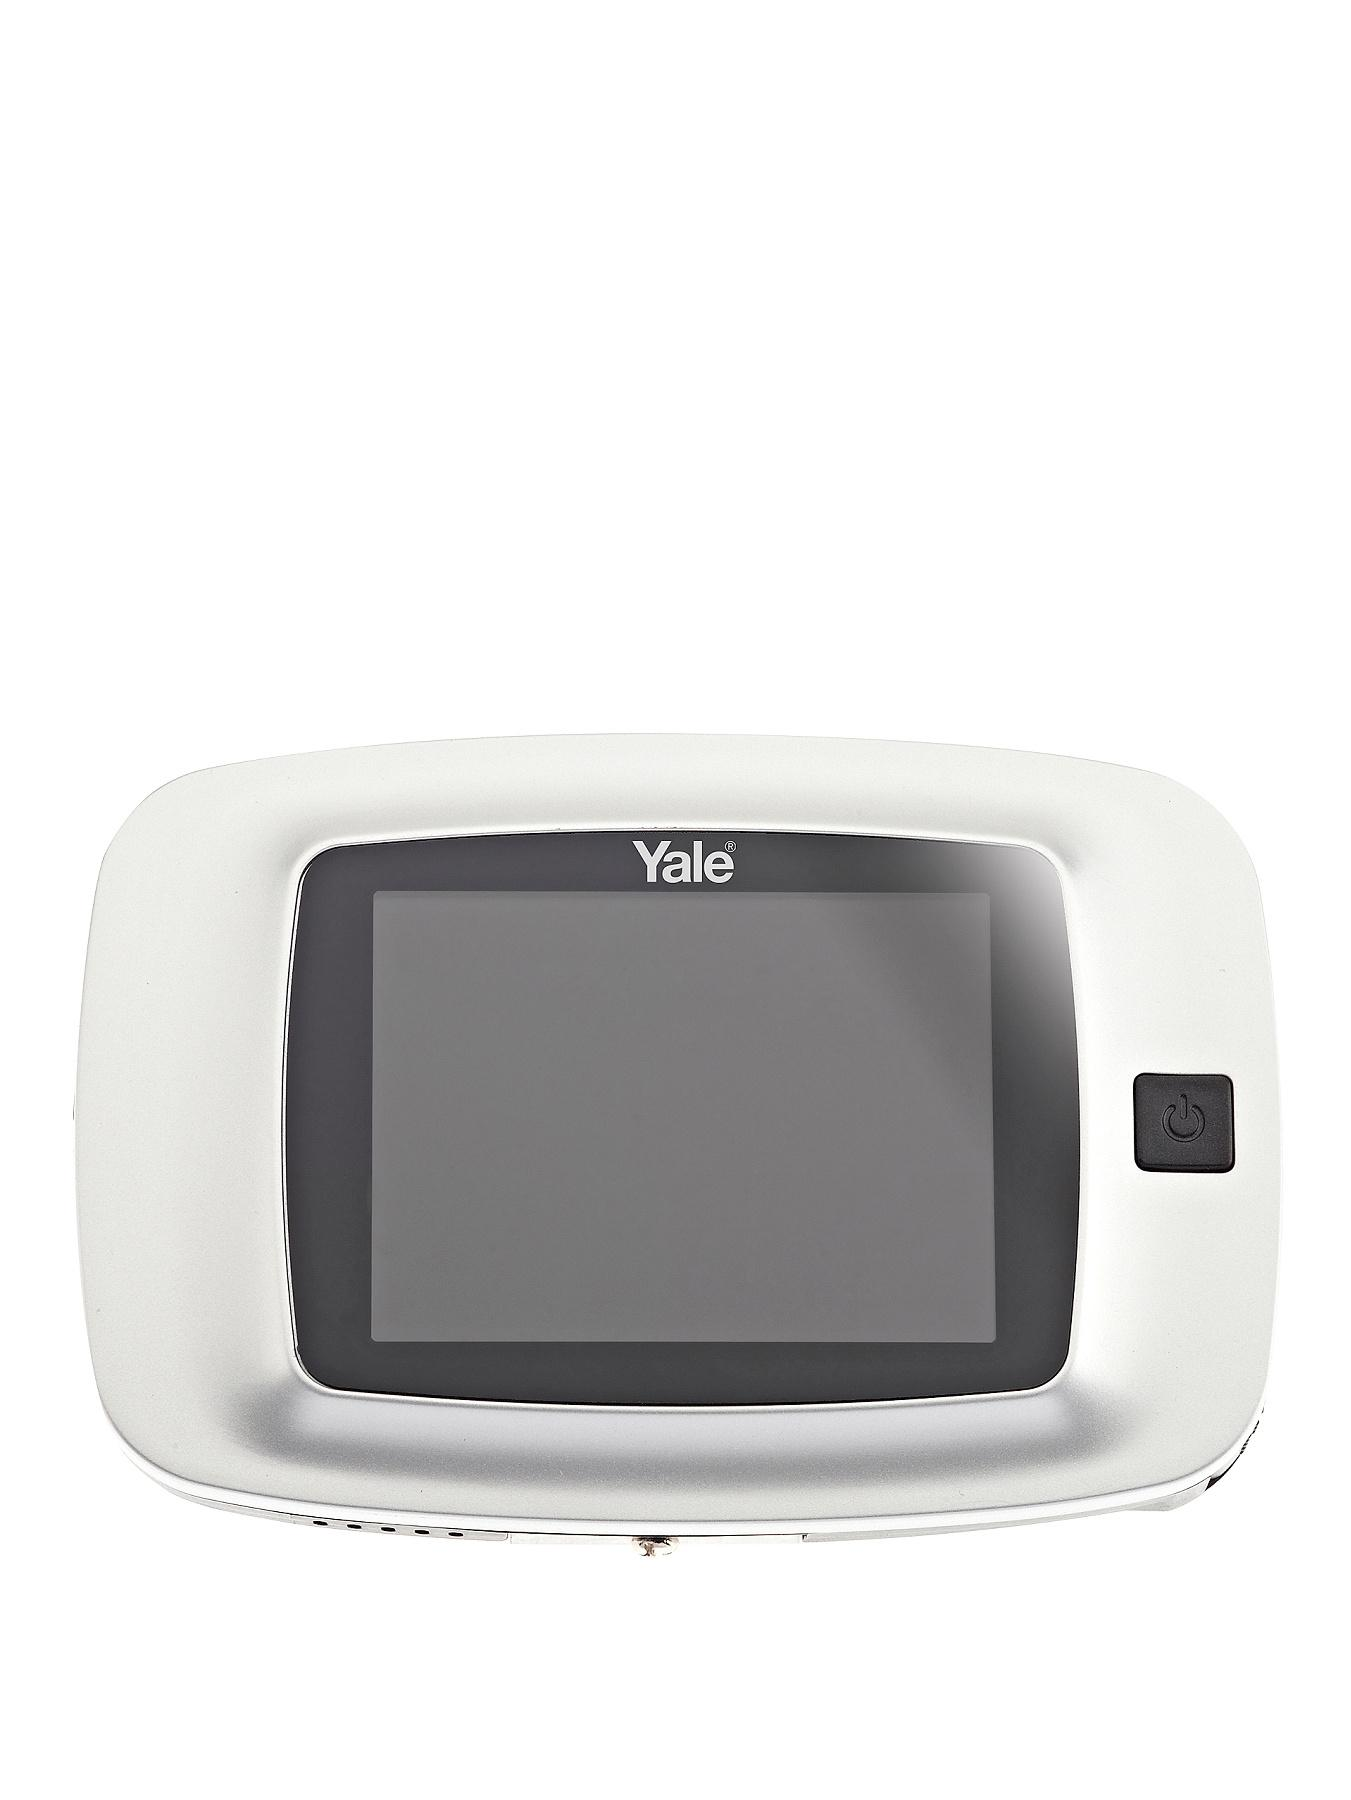 Yale Recording Digital Door Viewer with Internal Memory